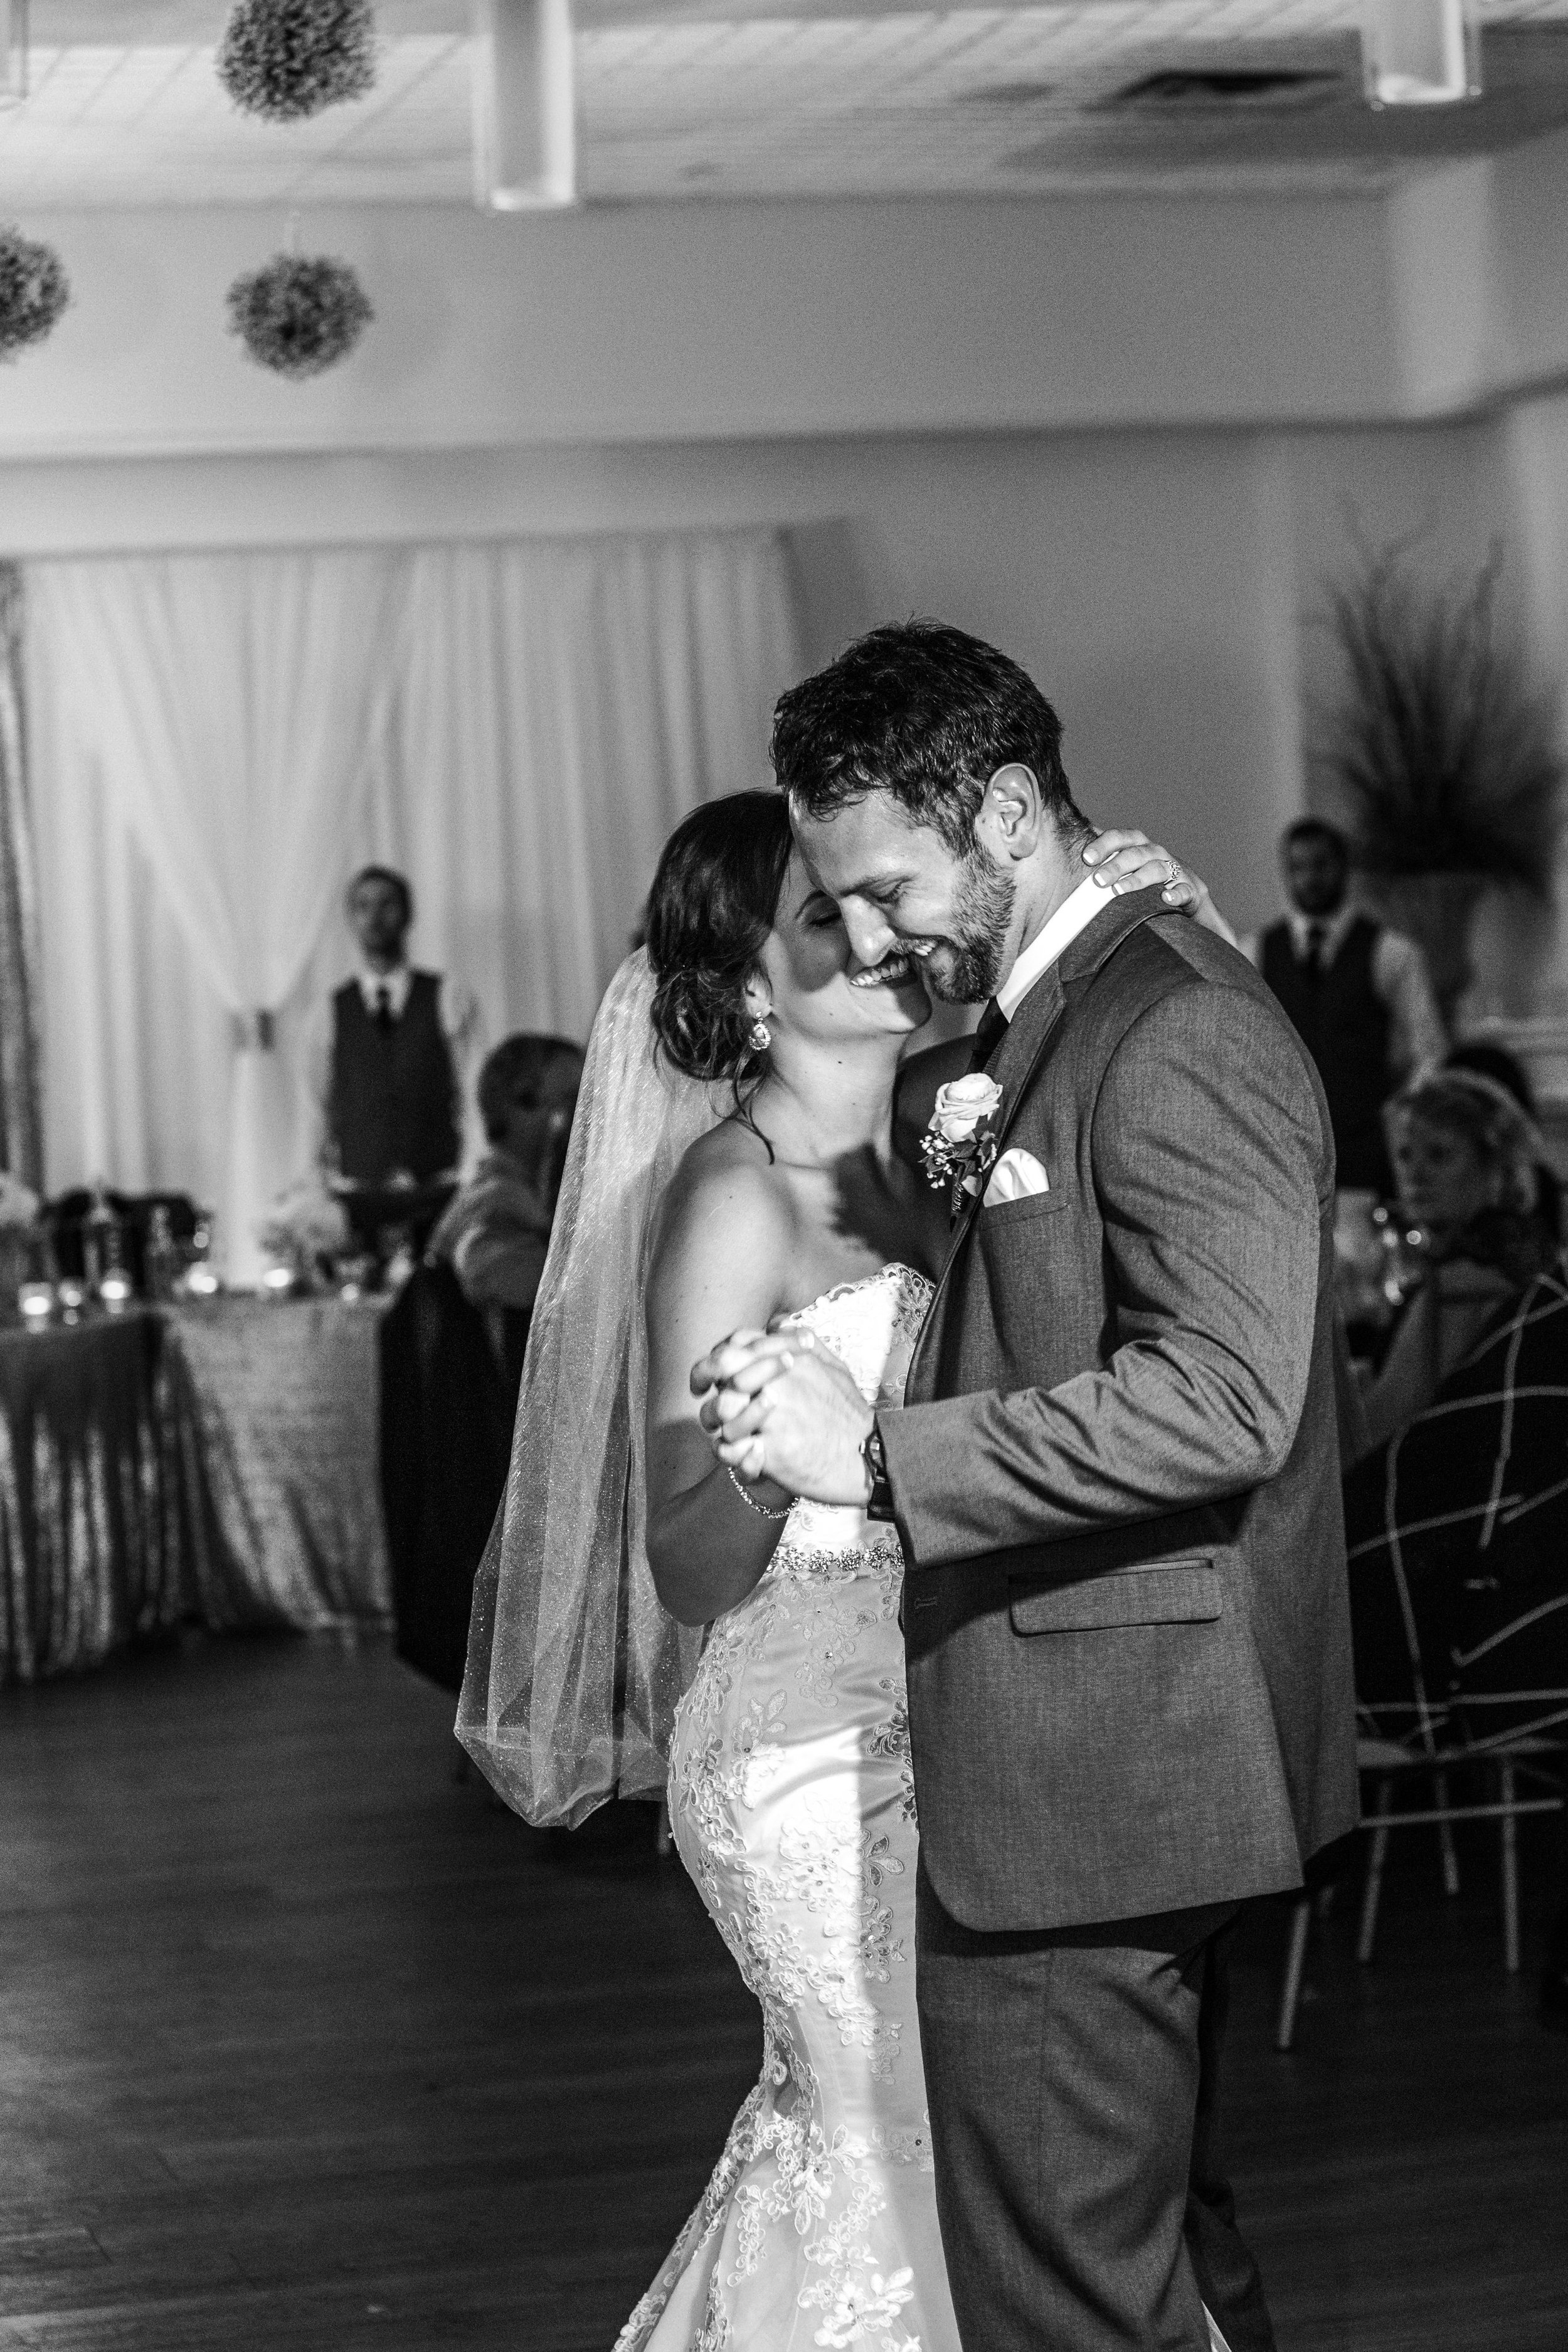 bride-groom-wedding-firstdance-black-white